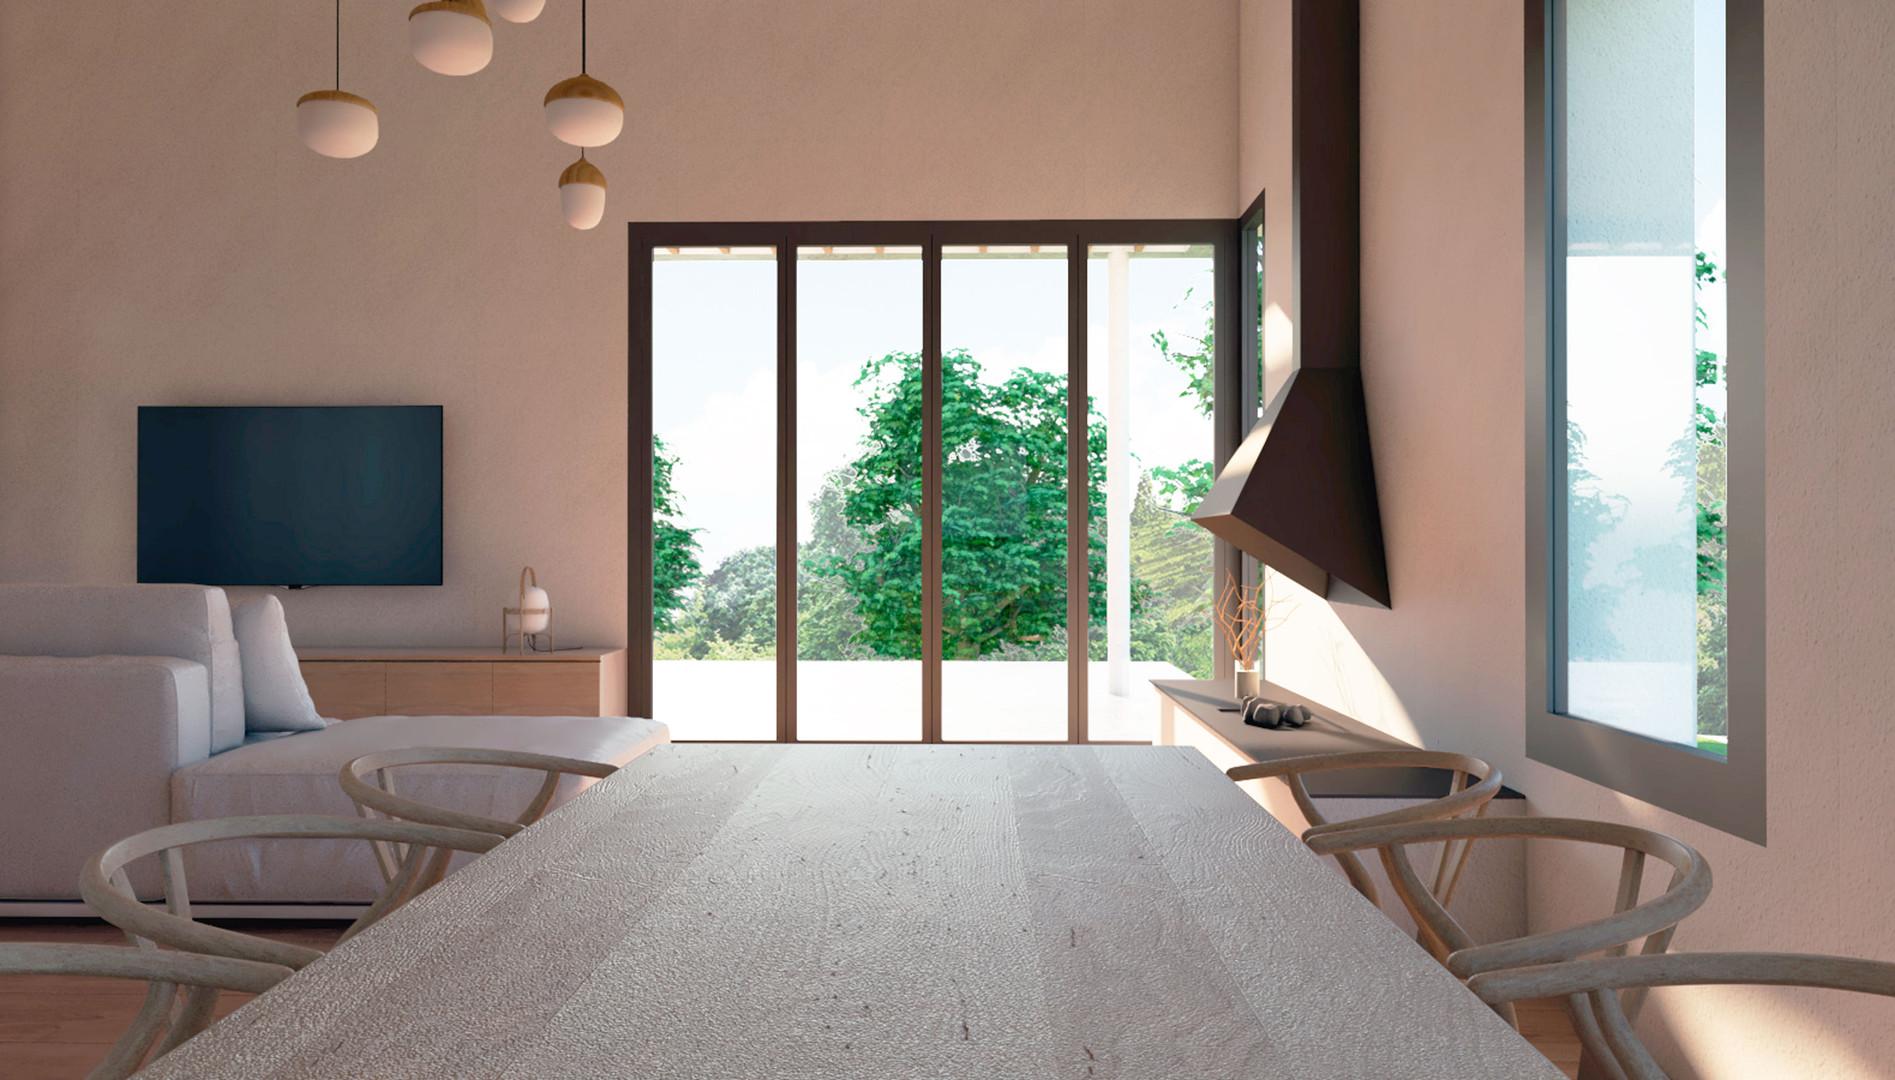 arquitectura-senmais-17.12.04.jpg